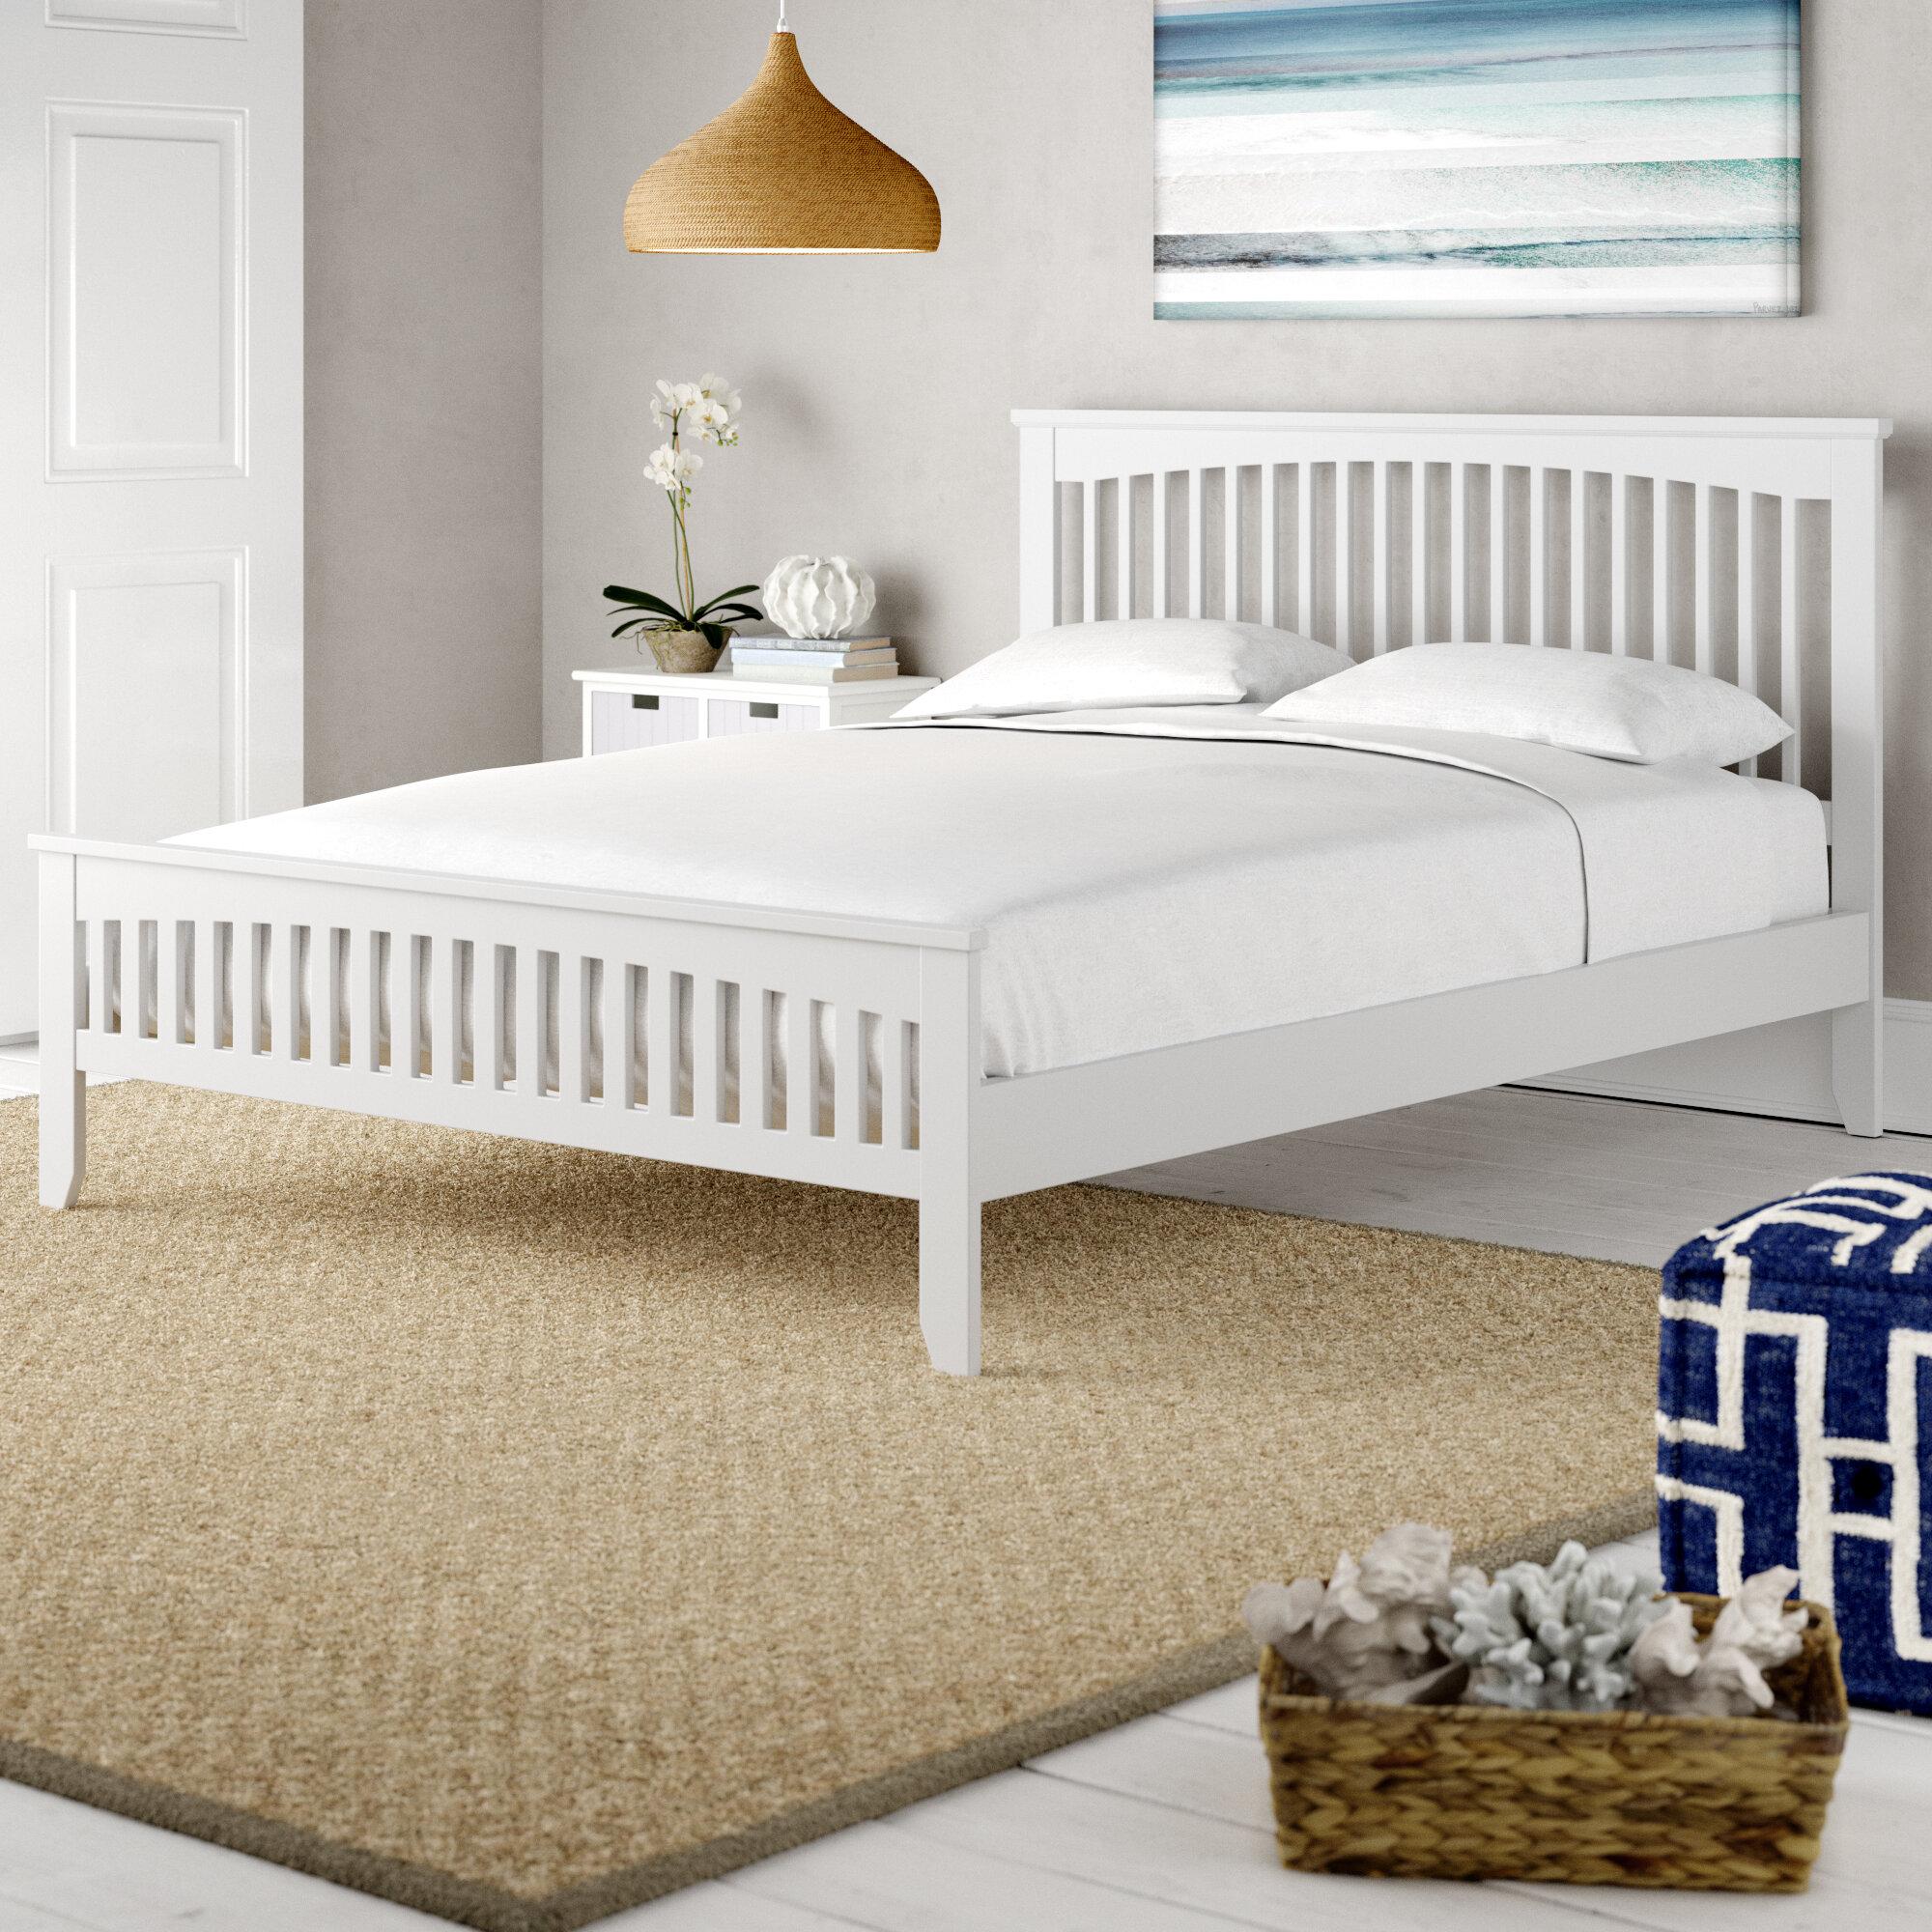 Breakwater Bay Marina Bed Frame & Reviews | Wayfair.co.uk